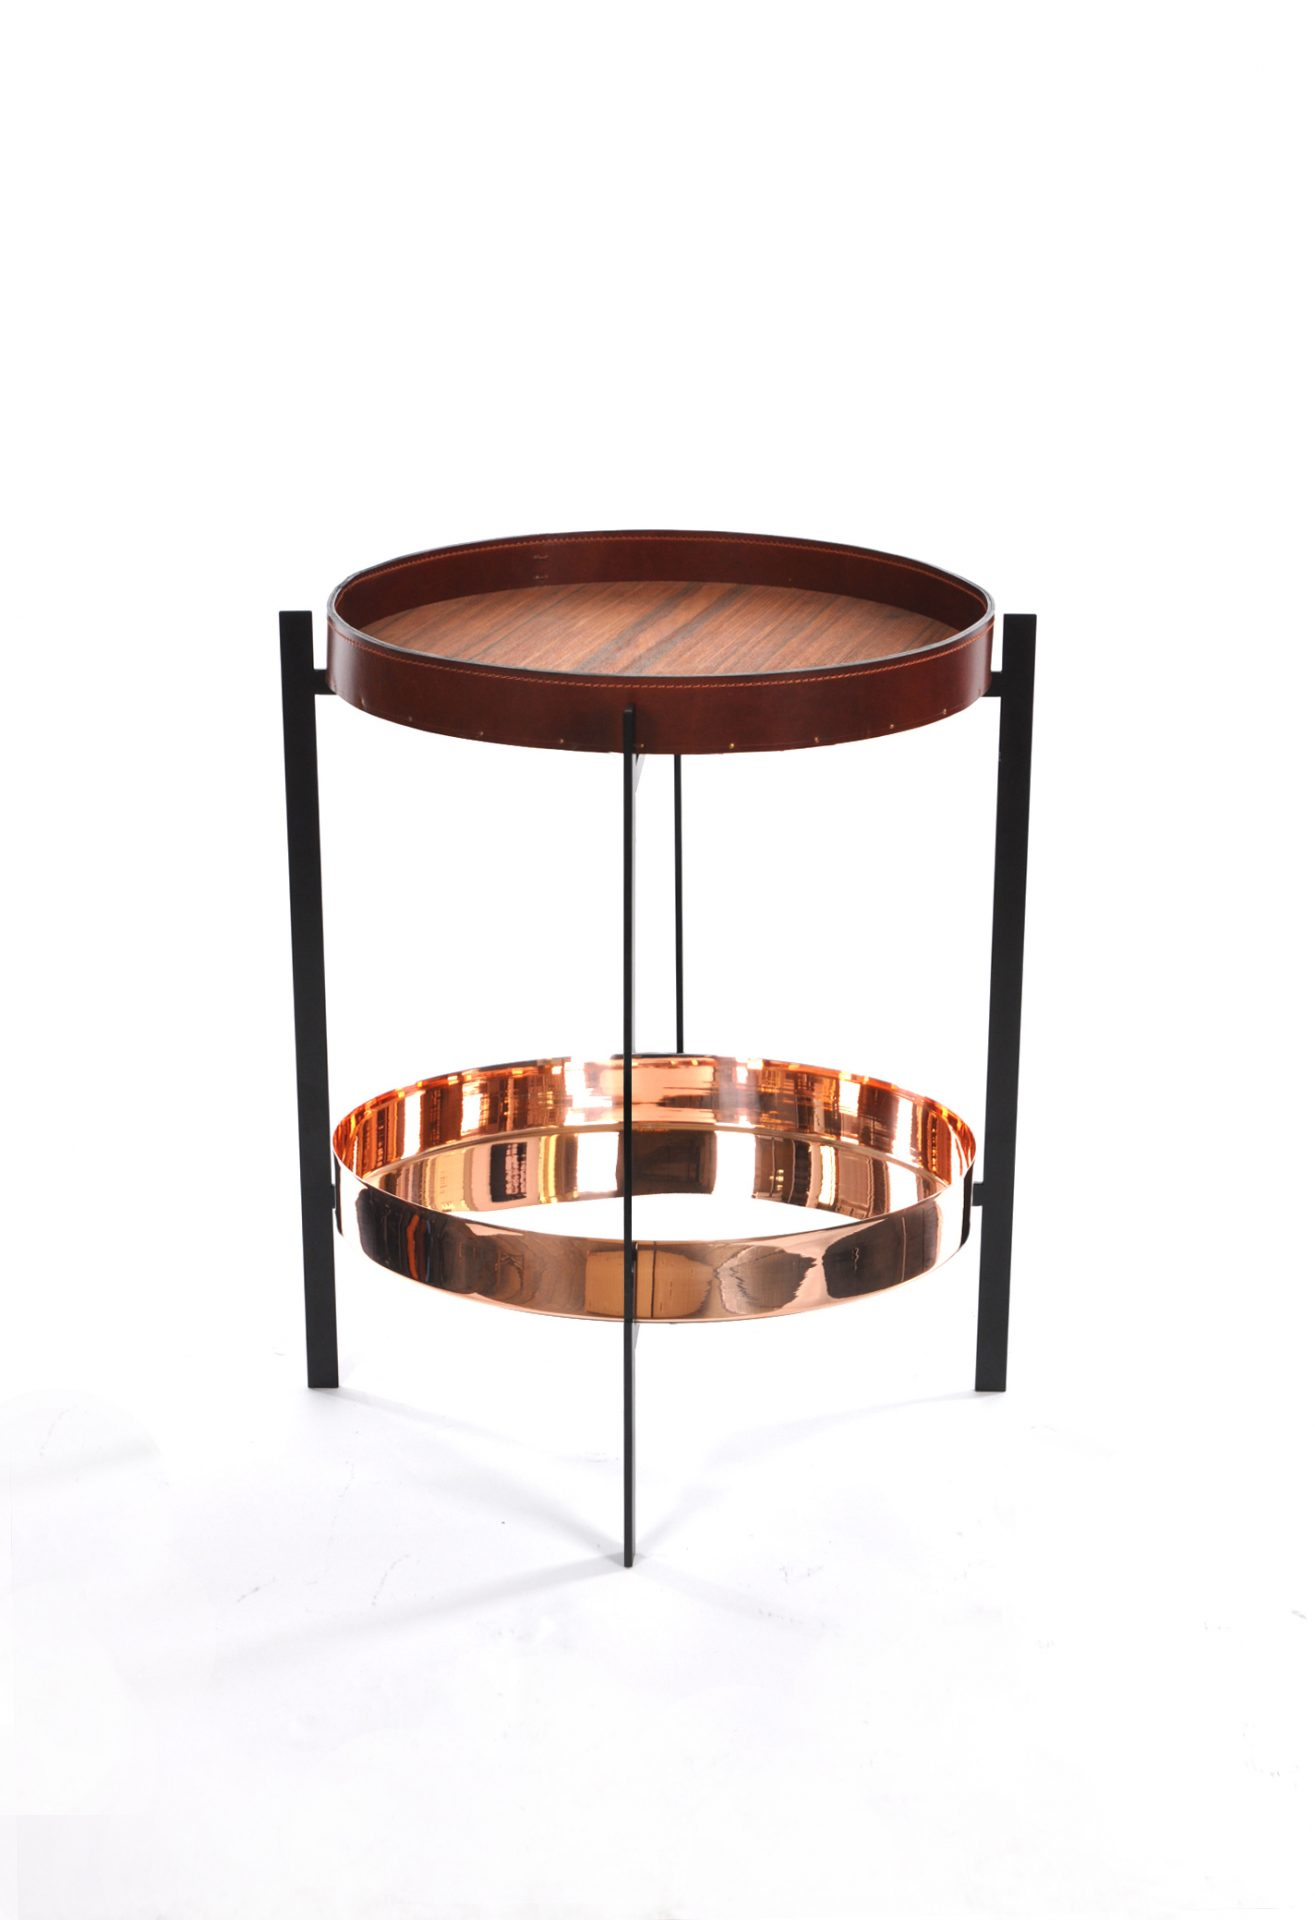 Deck Table cognac leather_Cobber tray_Black copy (1)